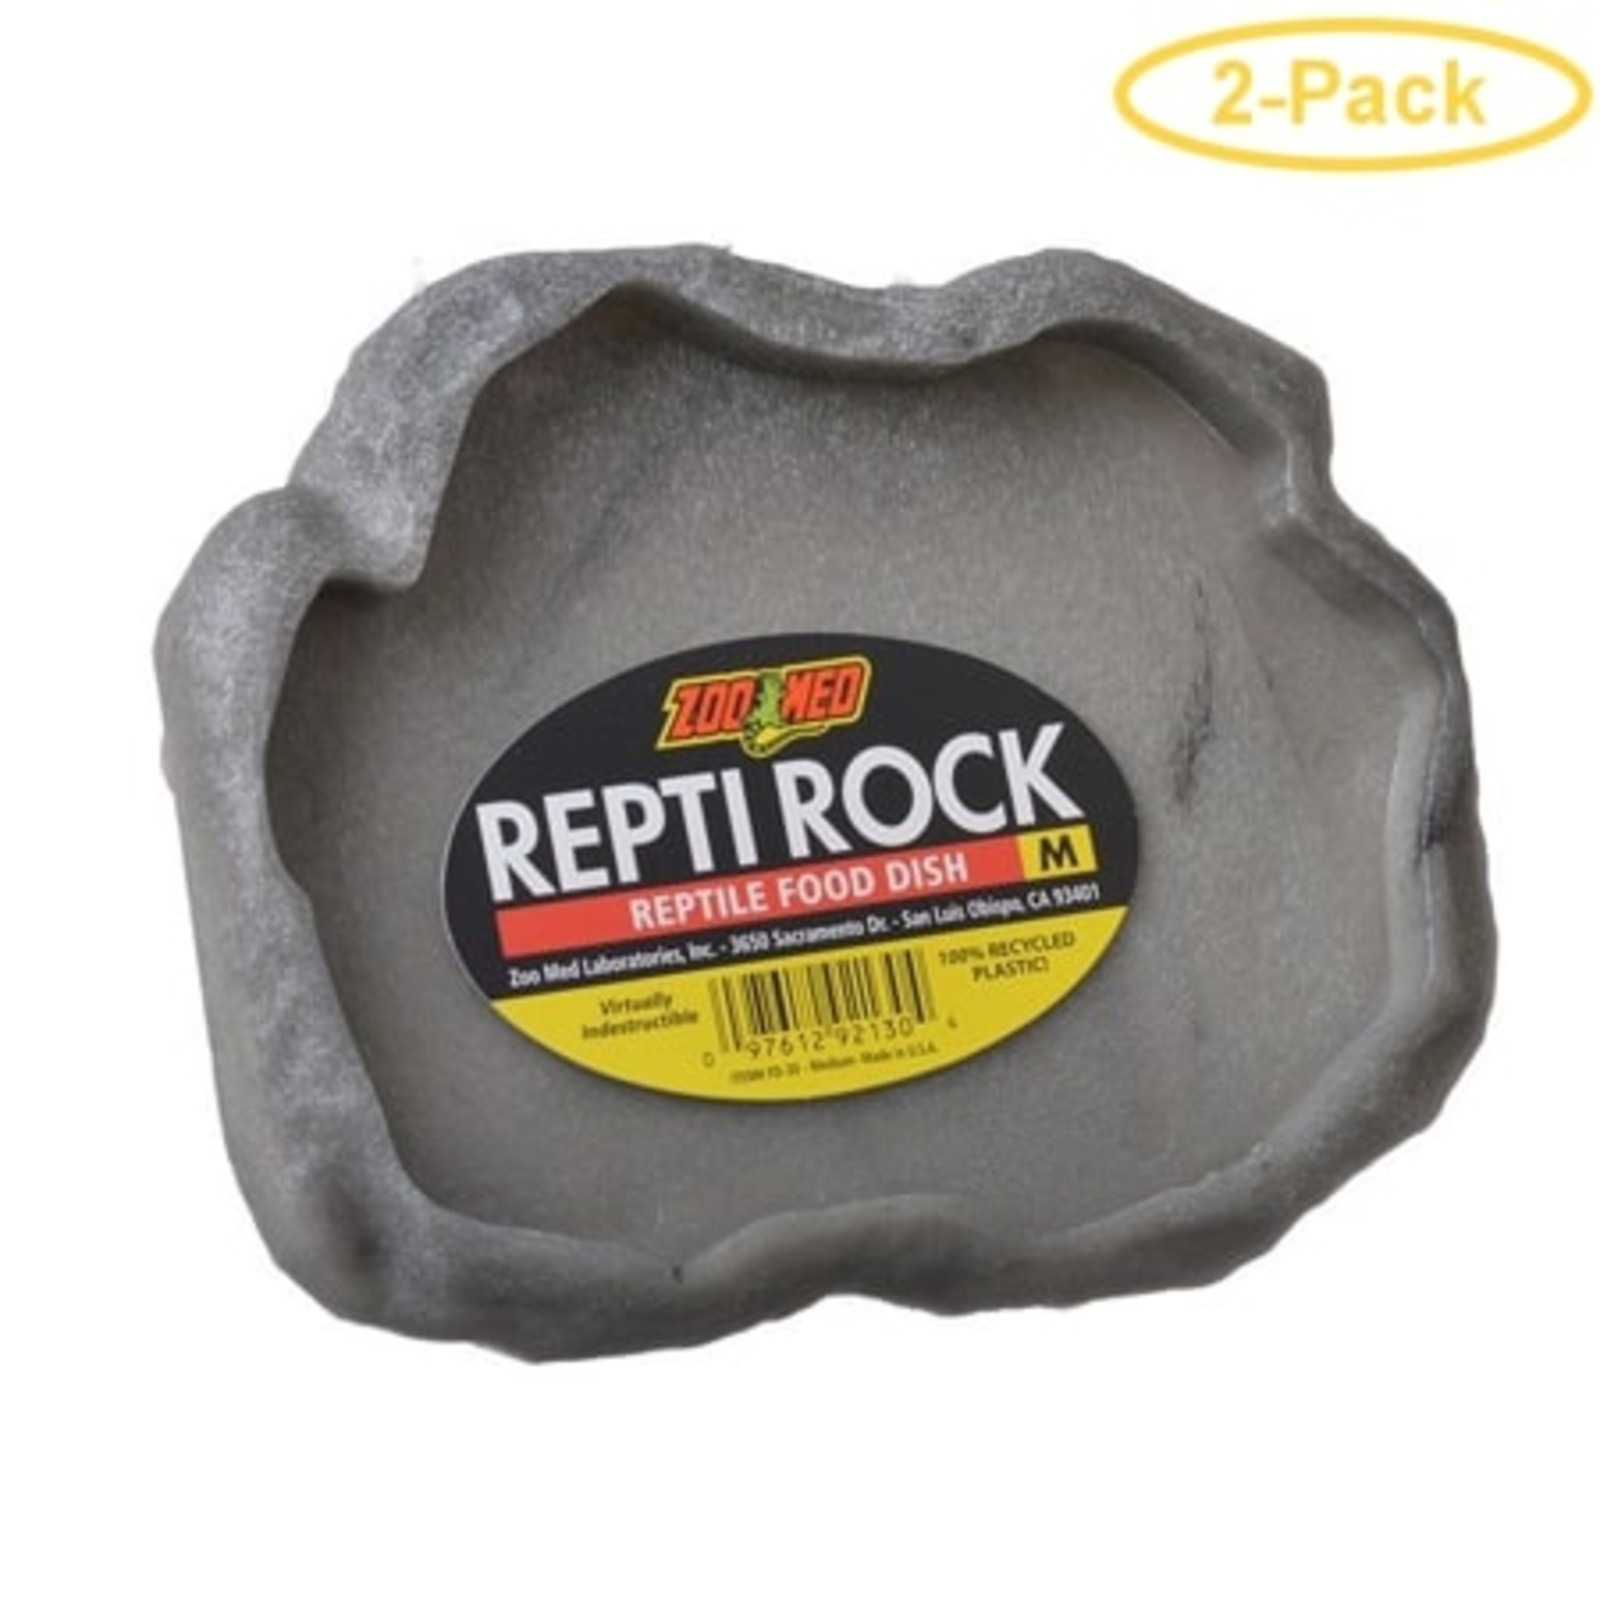 Zoo Med Repti Rock Food Dish (M)